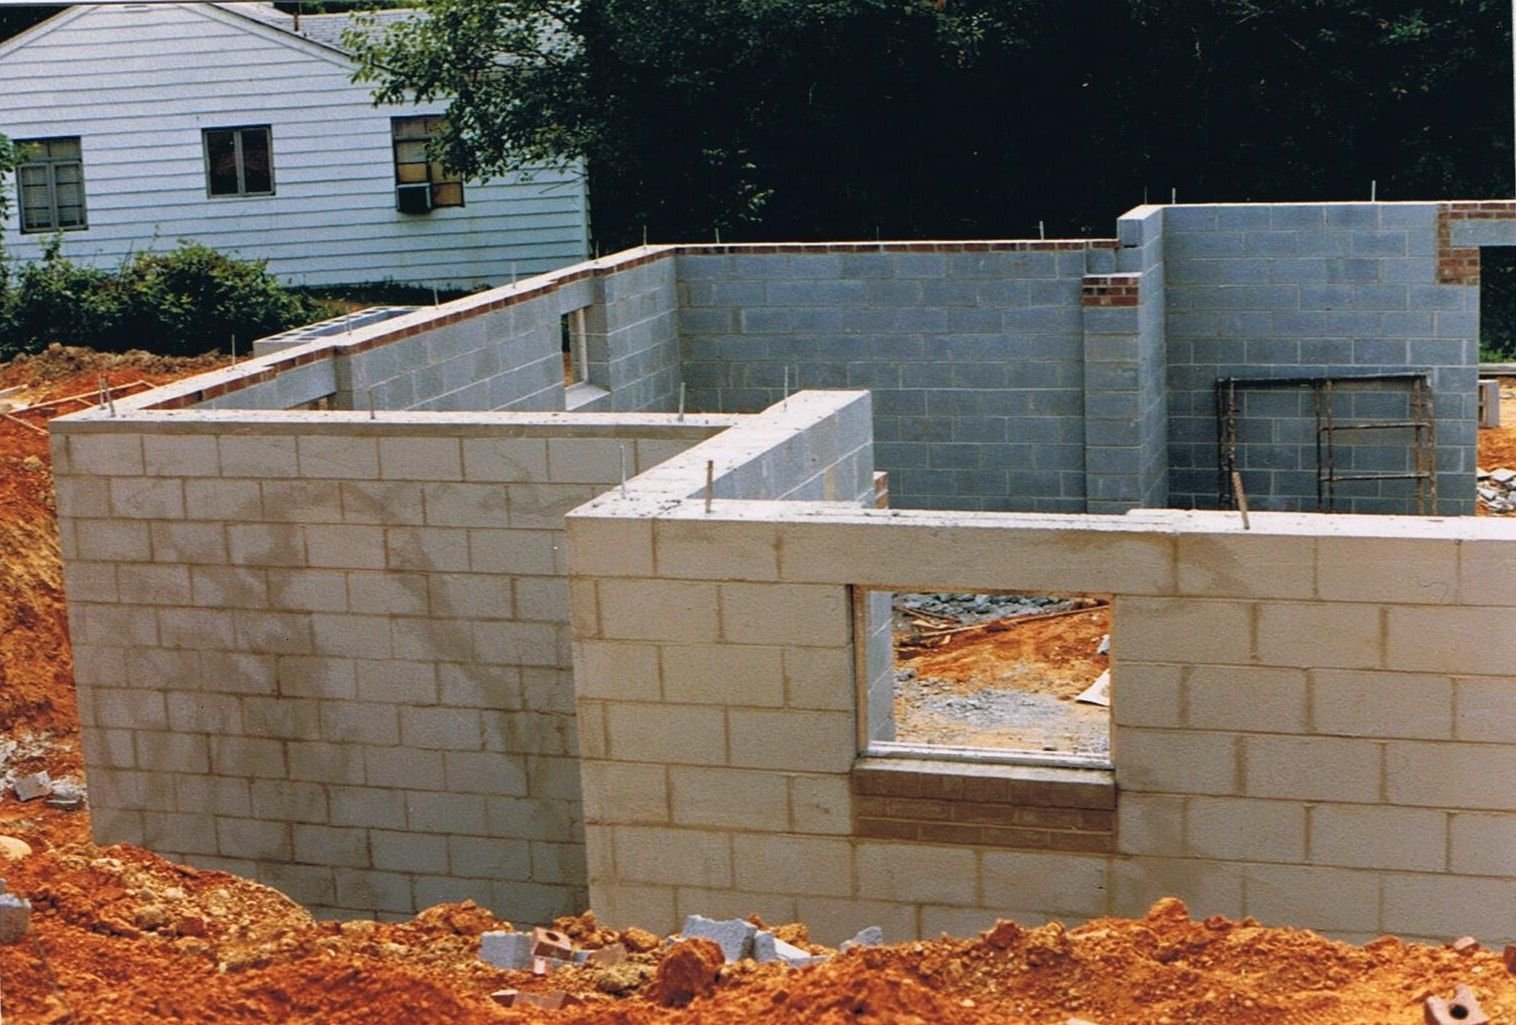 Concrete Block Foundation Repair How To Repair Foundation Cracks Concrete Blocks Cinder Block Walls Cinder Block House